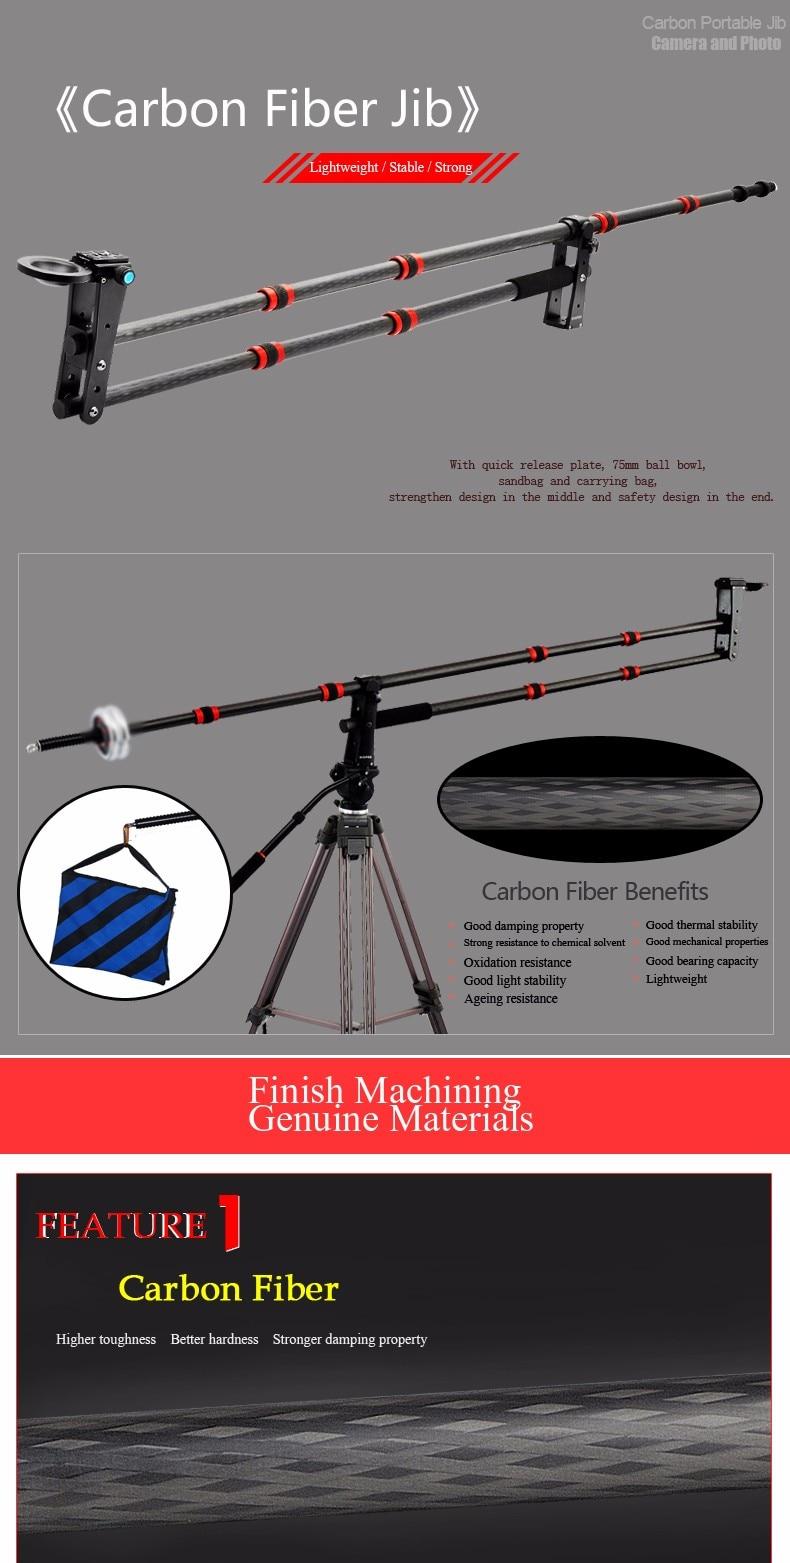 DIGIPOD CJIB-20C DSLR Photography Camera Carbon Fiber Jib 5